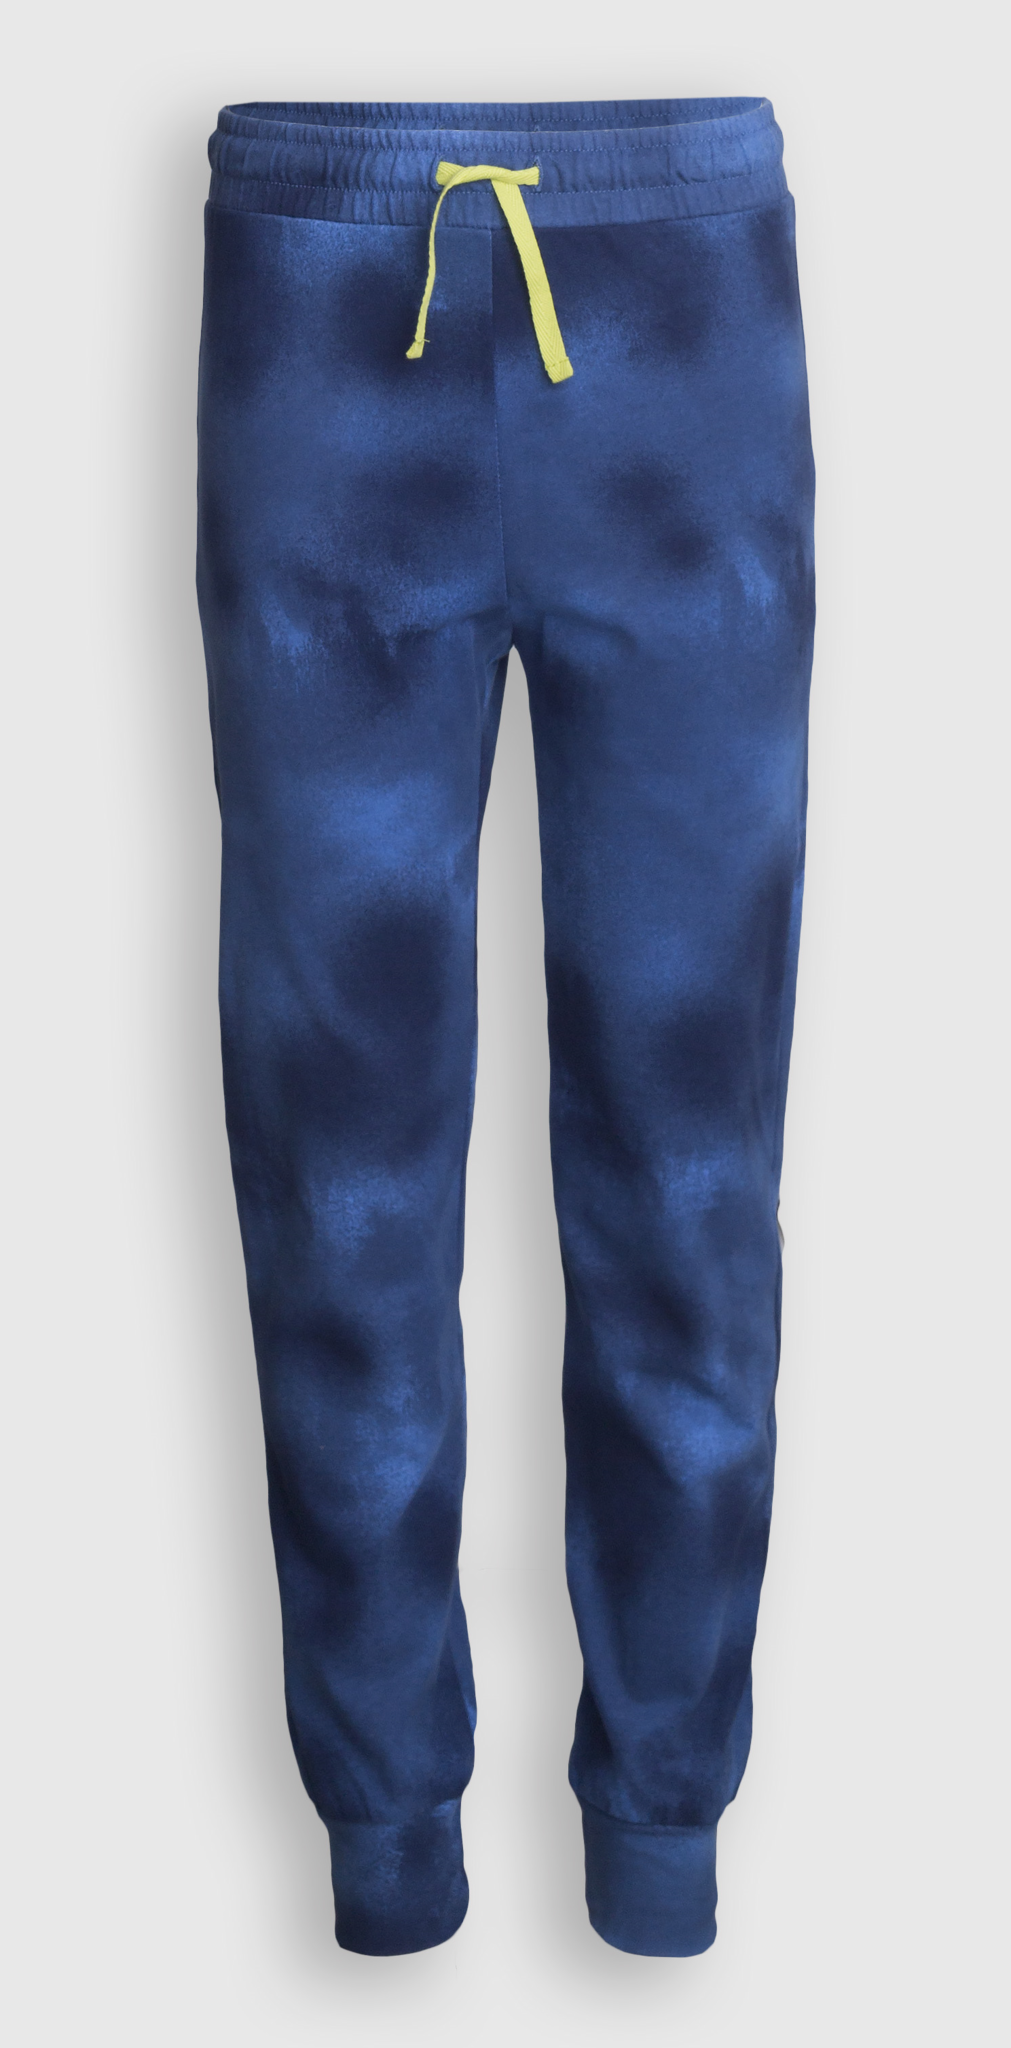 Детские мужские брюки пижамные E18K-23D101